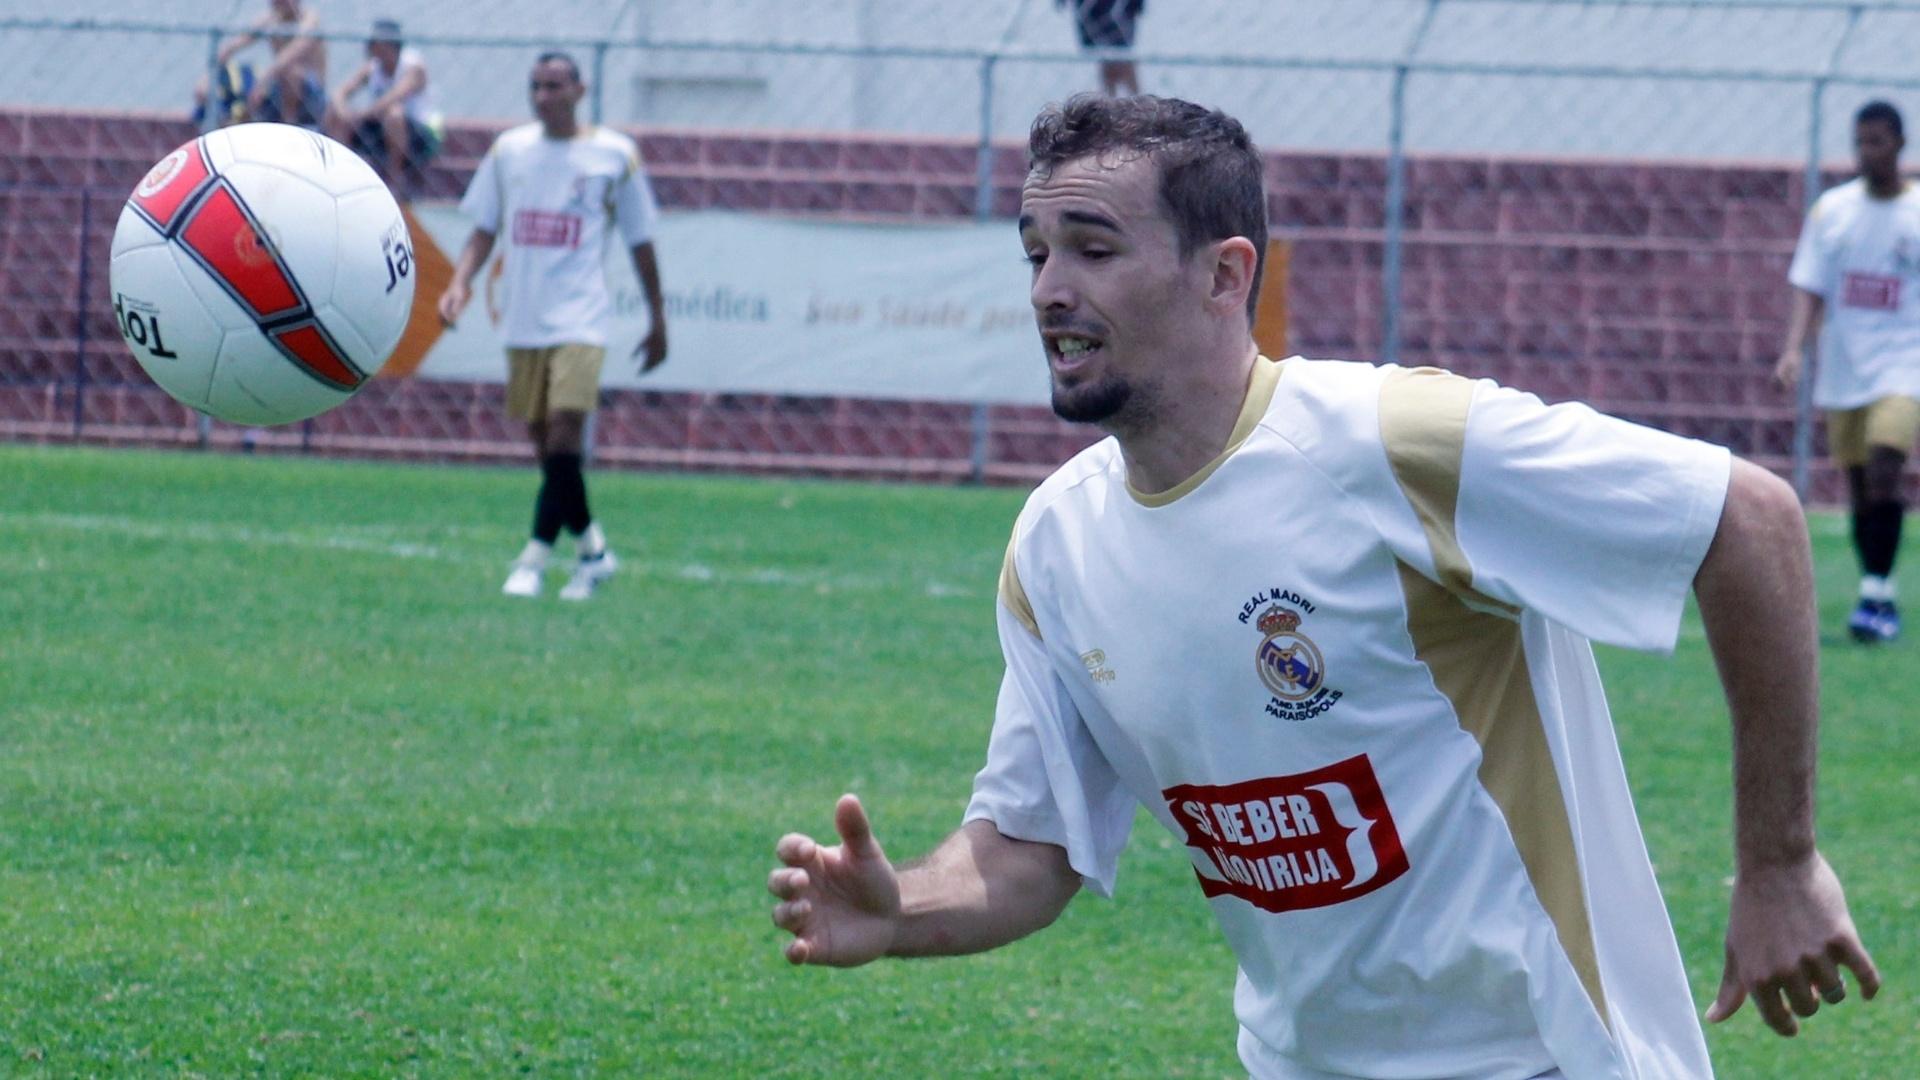 Jogador do Real Madri durante semifinal da série B da Copa Kaiser contra o Internacional